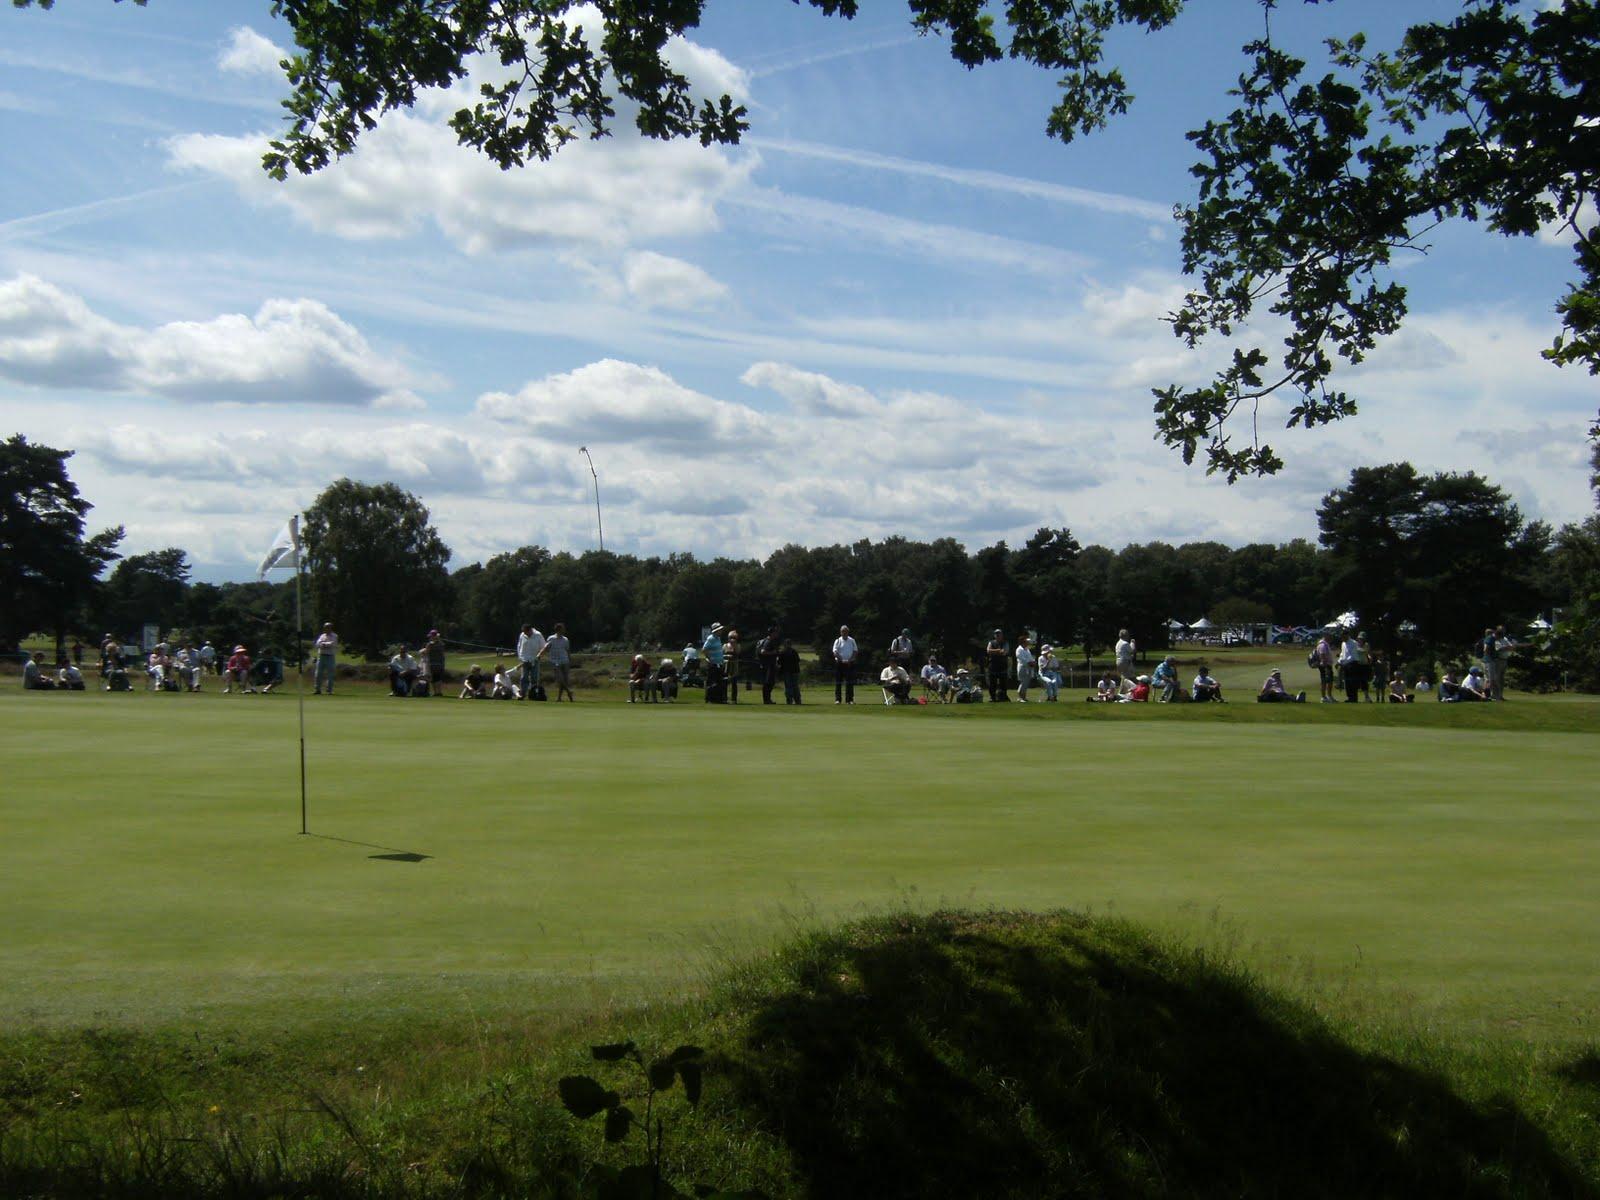 DSCF8939 Seniors Open, Walton Heath golf course